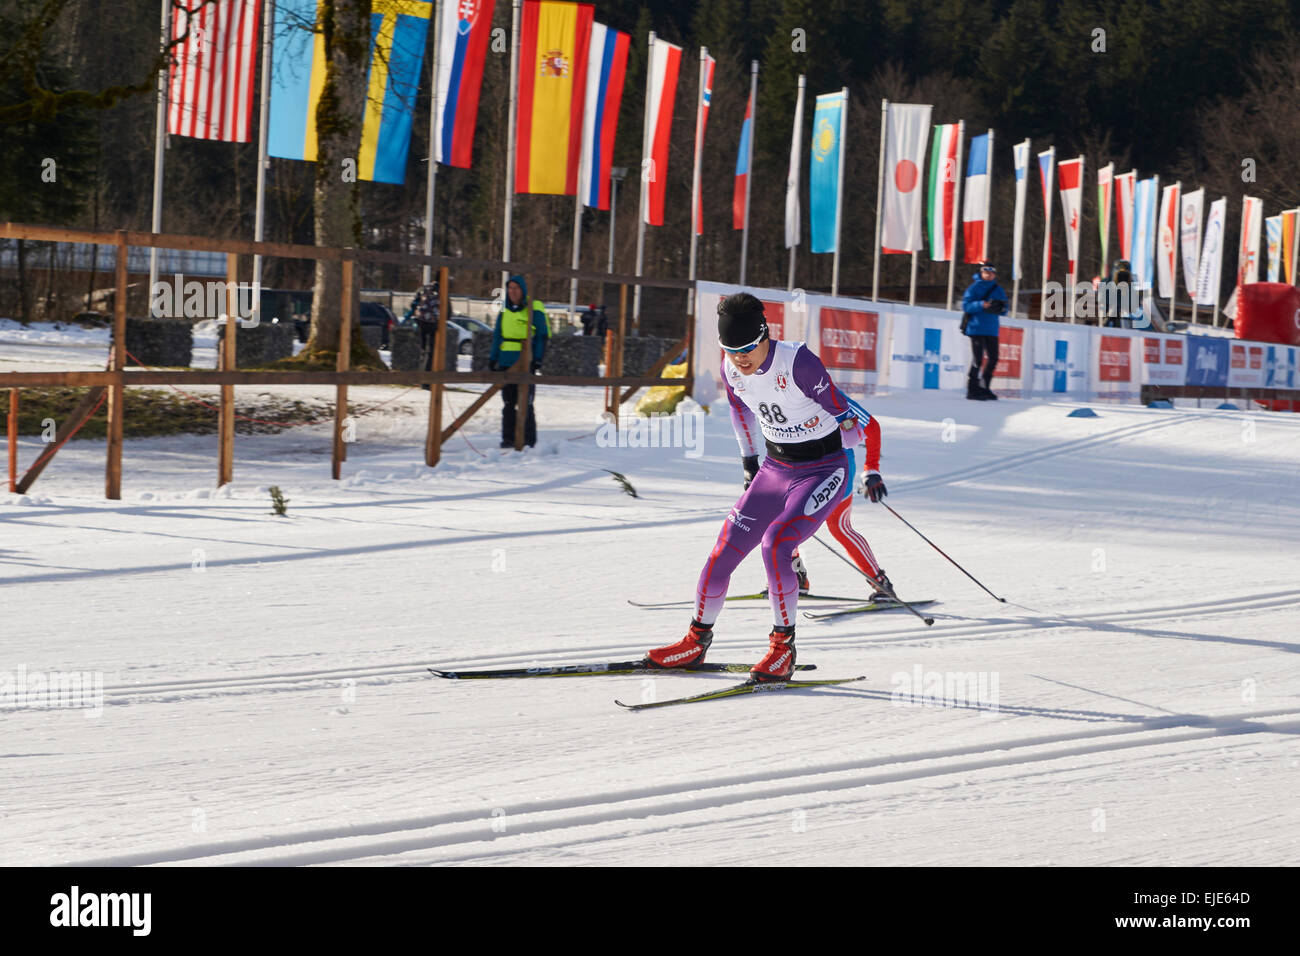 oberstdorf women 本站(bt蚂蚁)是最大的bt资源搜索引擎,提供下载资源的索引服务。 收藏》》》本站网址:wwwbtanttcom ccs120101tdswomenoberstdorfskiathlon720p-skisr08 4768 mb.